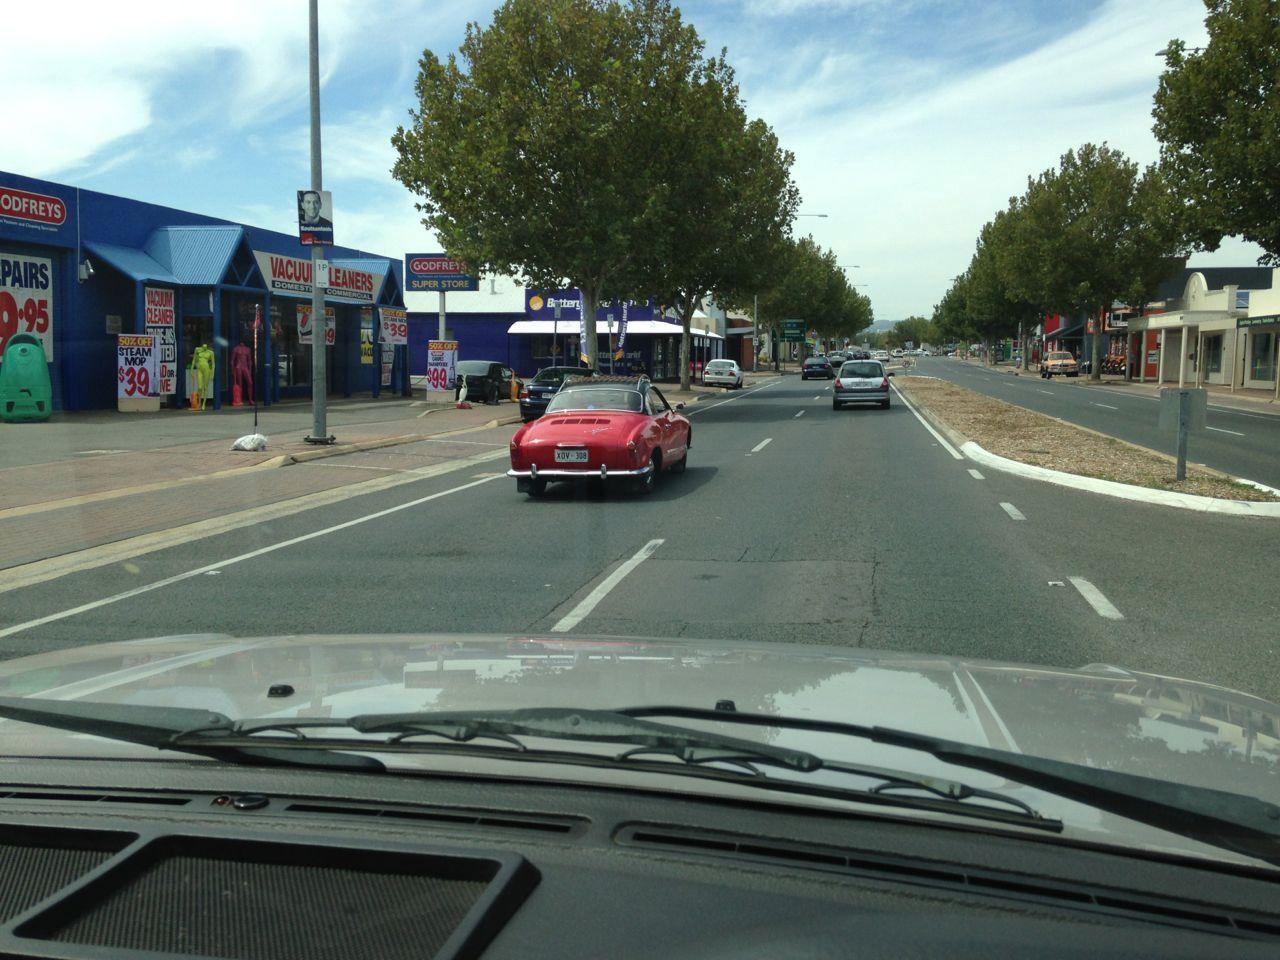 301a251413566068c36f287c.jpg - Ghia spotted on Bradman Drive